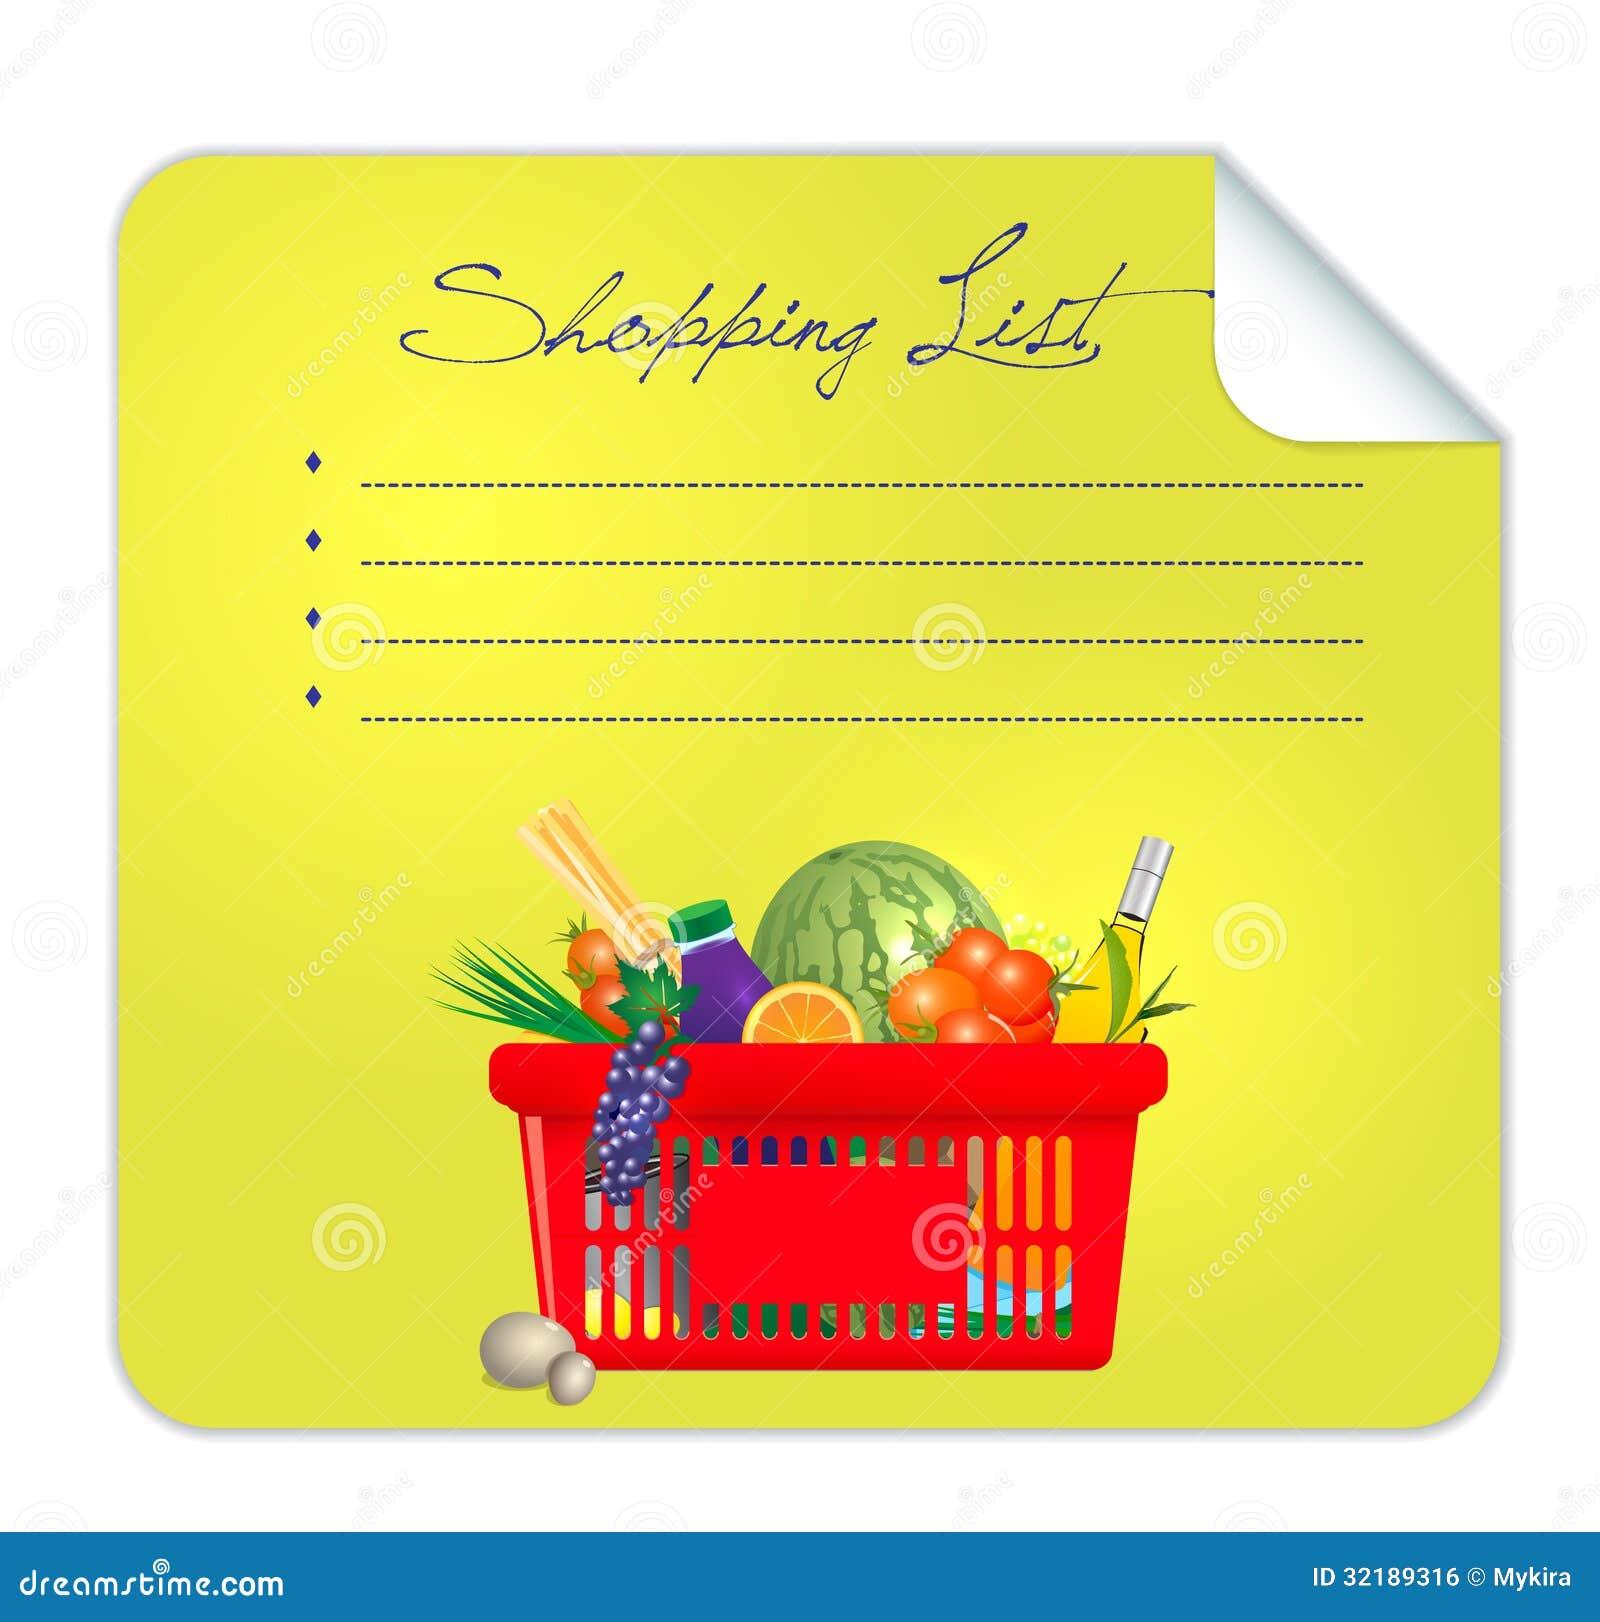 Vector Postit Shopping List Illustration Royalty Free Image – Shopping List Format